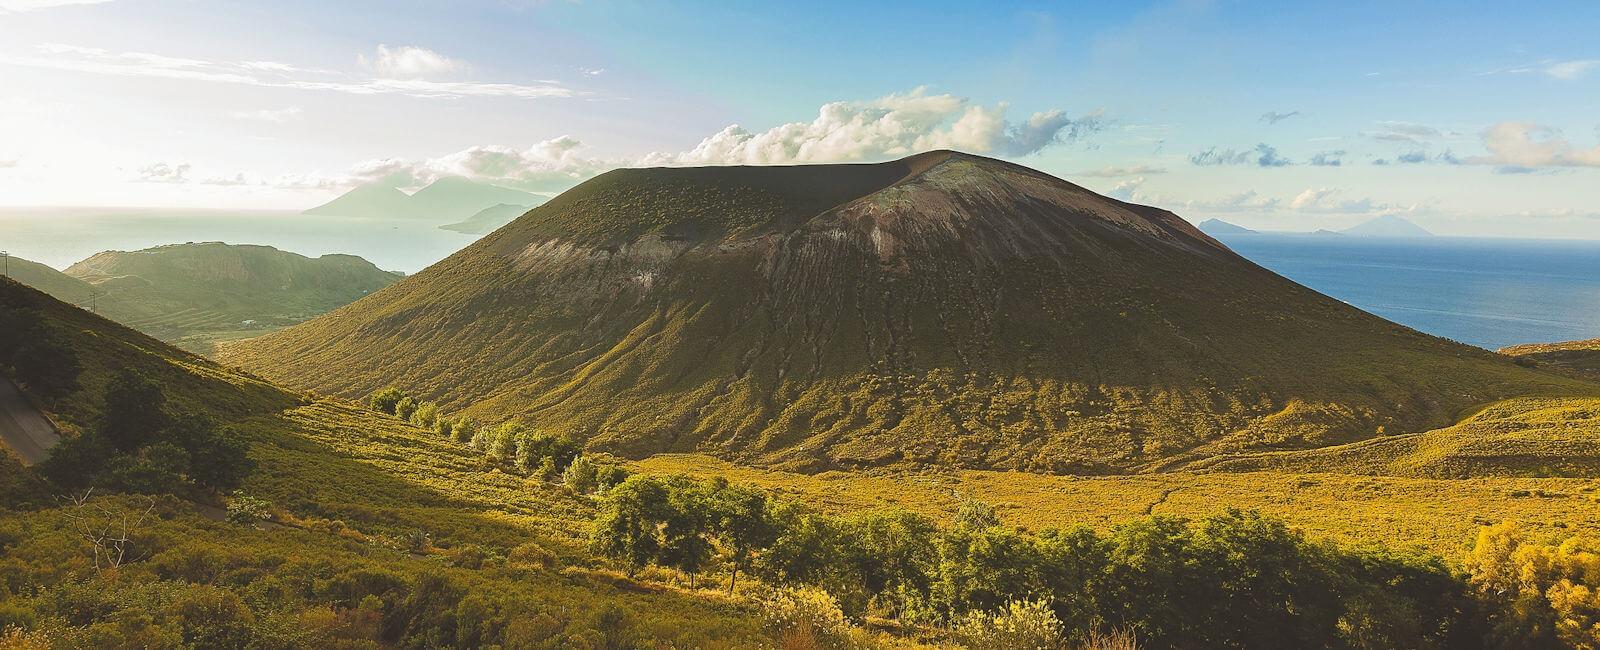 vulcano island holidays